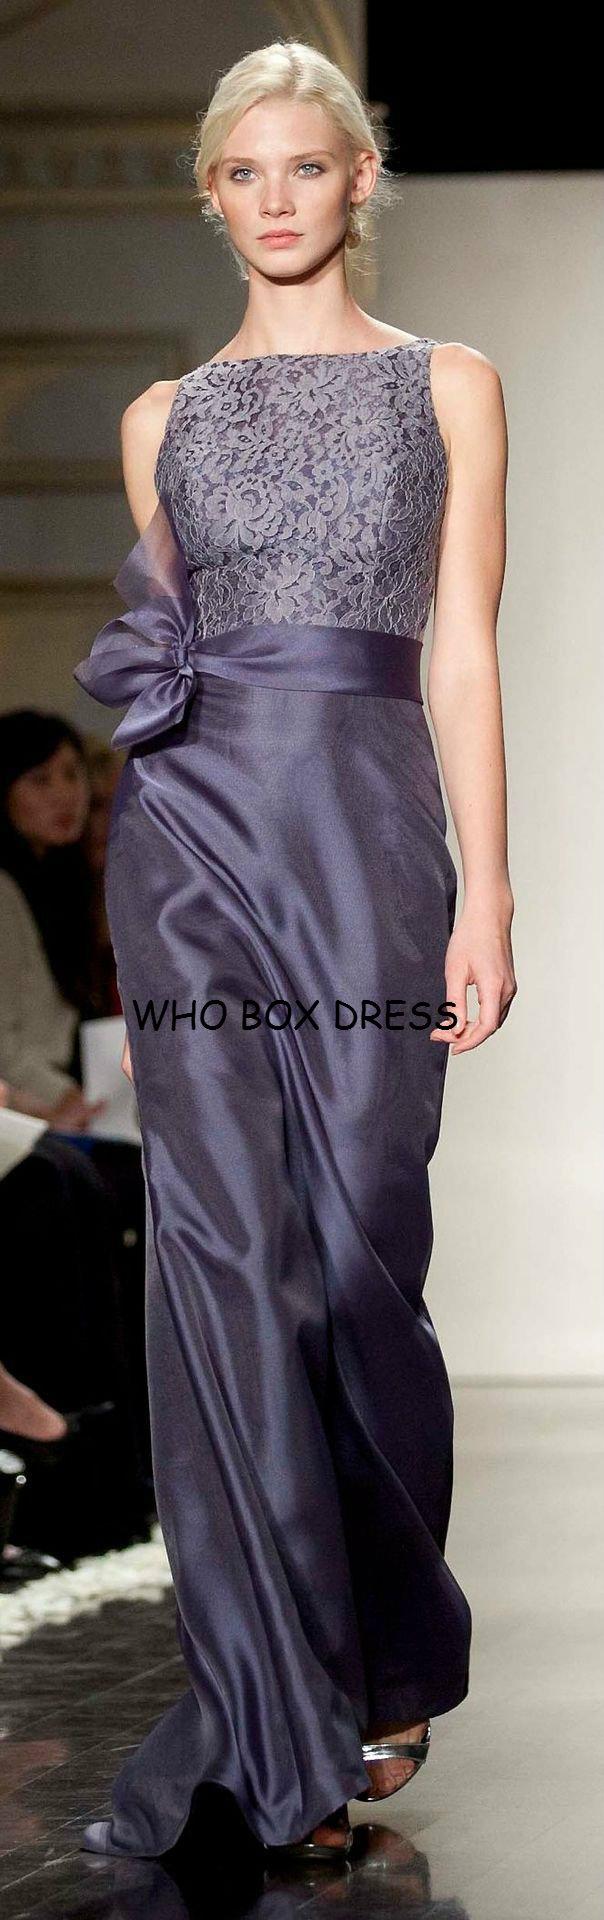 evening gown evening gown | Ropa que me gusta | Pinterest | Vestidos ...